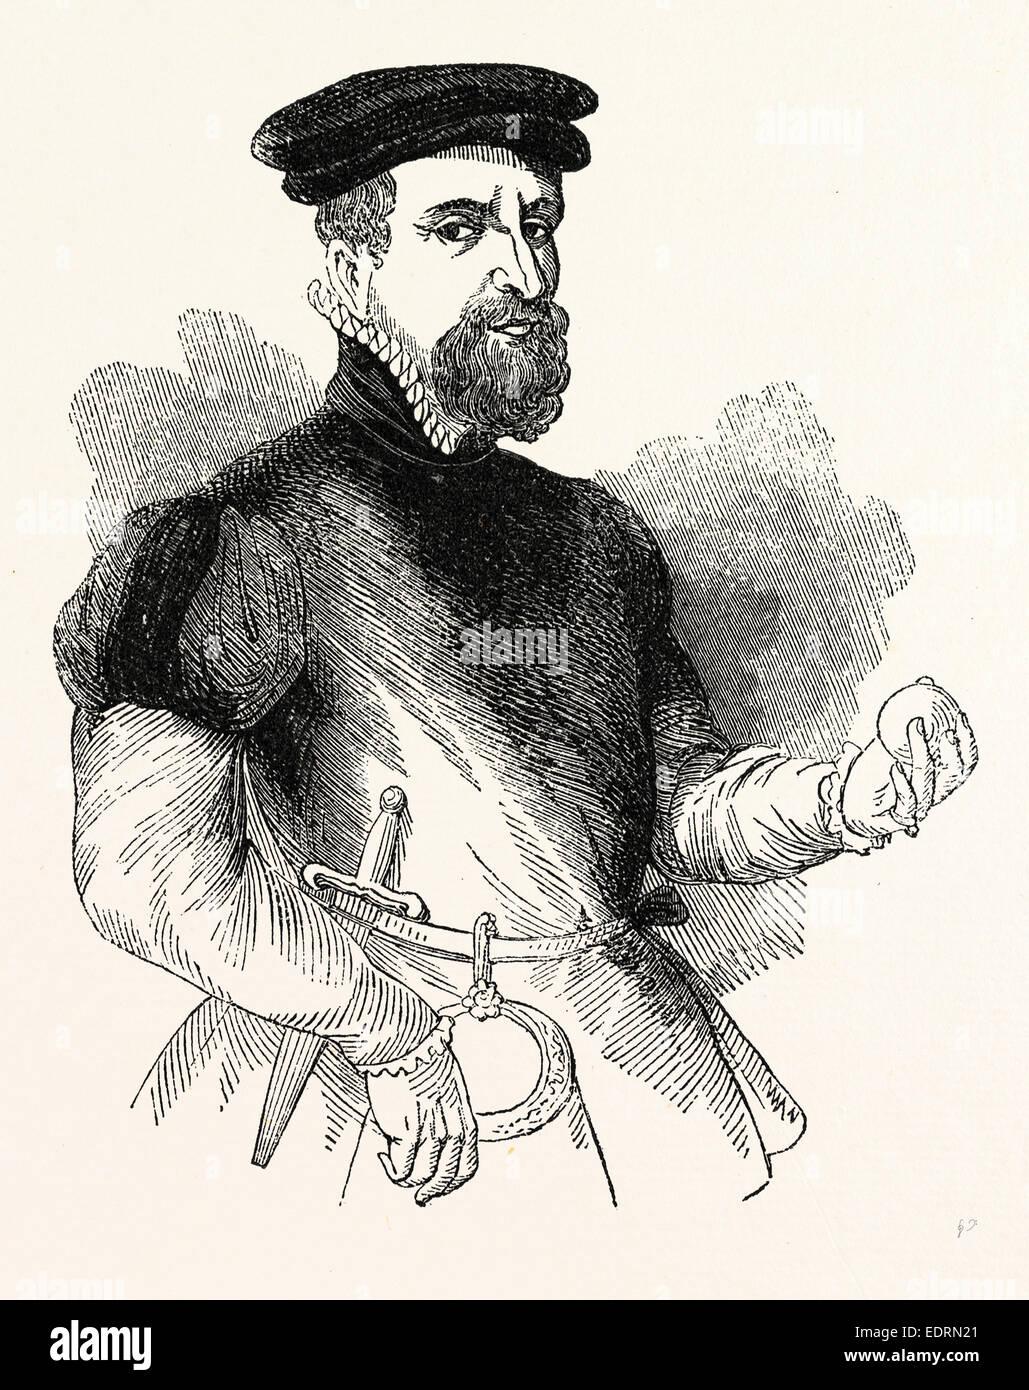 Portrait Sir Thomas Gresham, English merchant and financier, London, England, engraving 19th century, Britain, UK - Stock Image